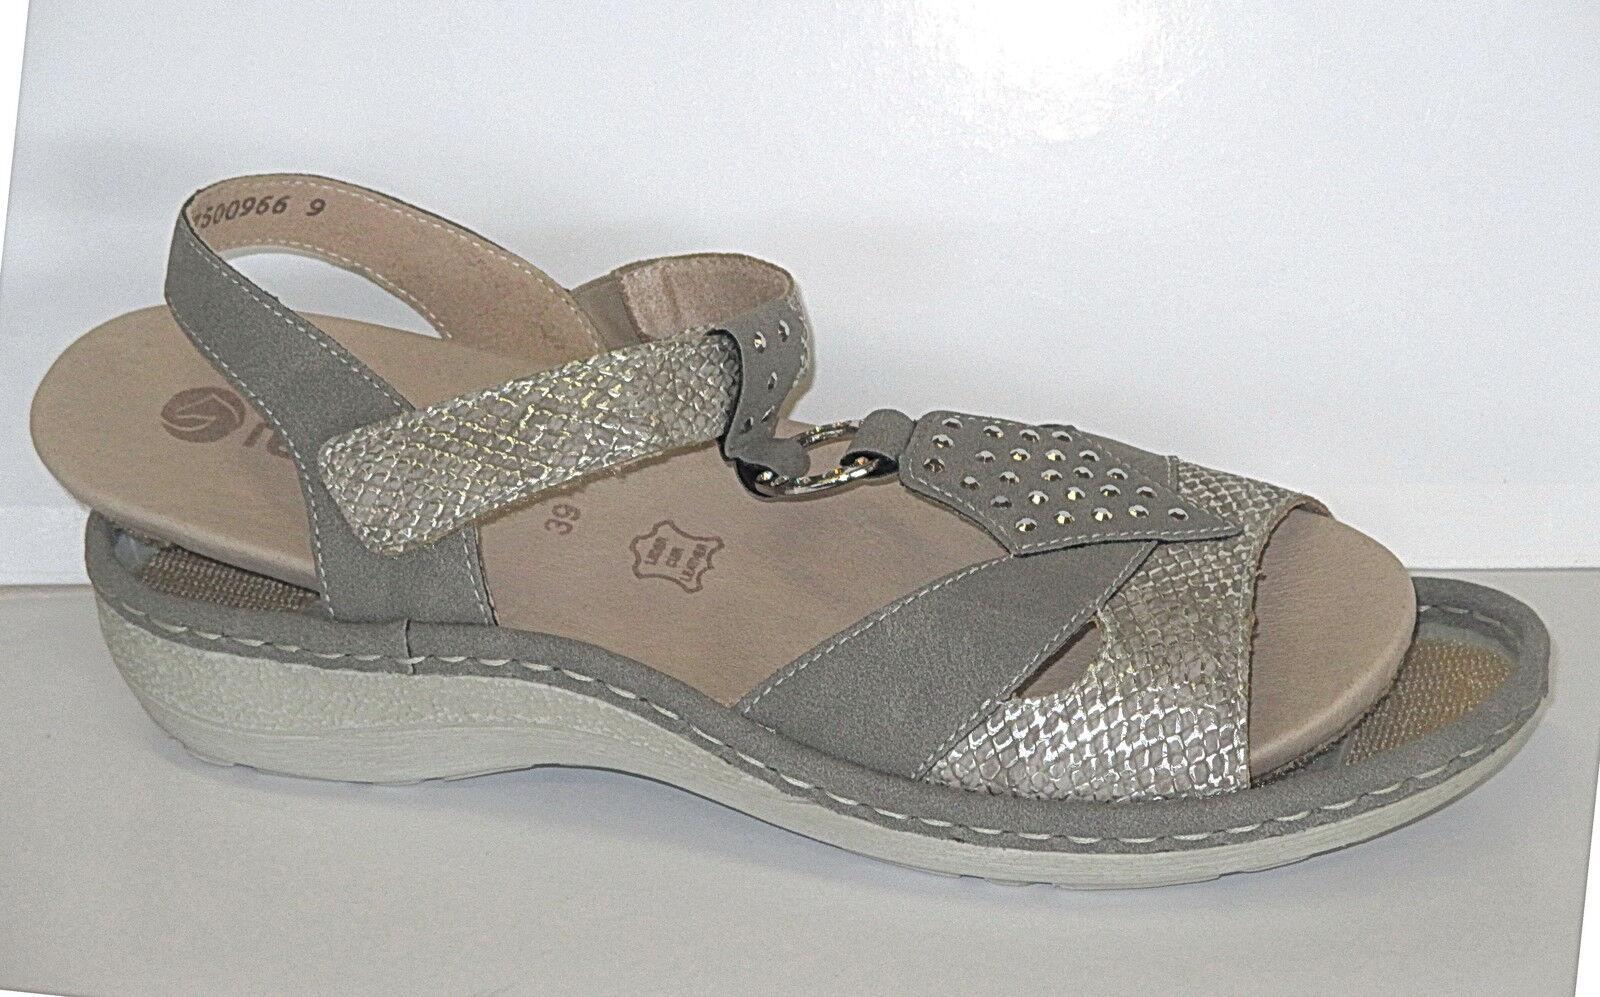 Remonte Schuhe +NEU+ 39 41, Gr. Innensohle, herausnehmbare